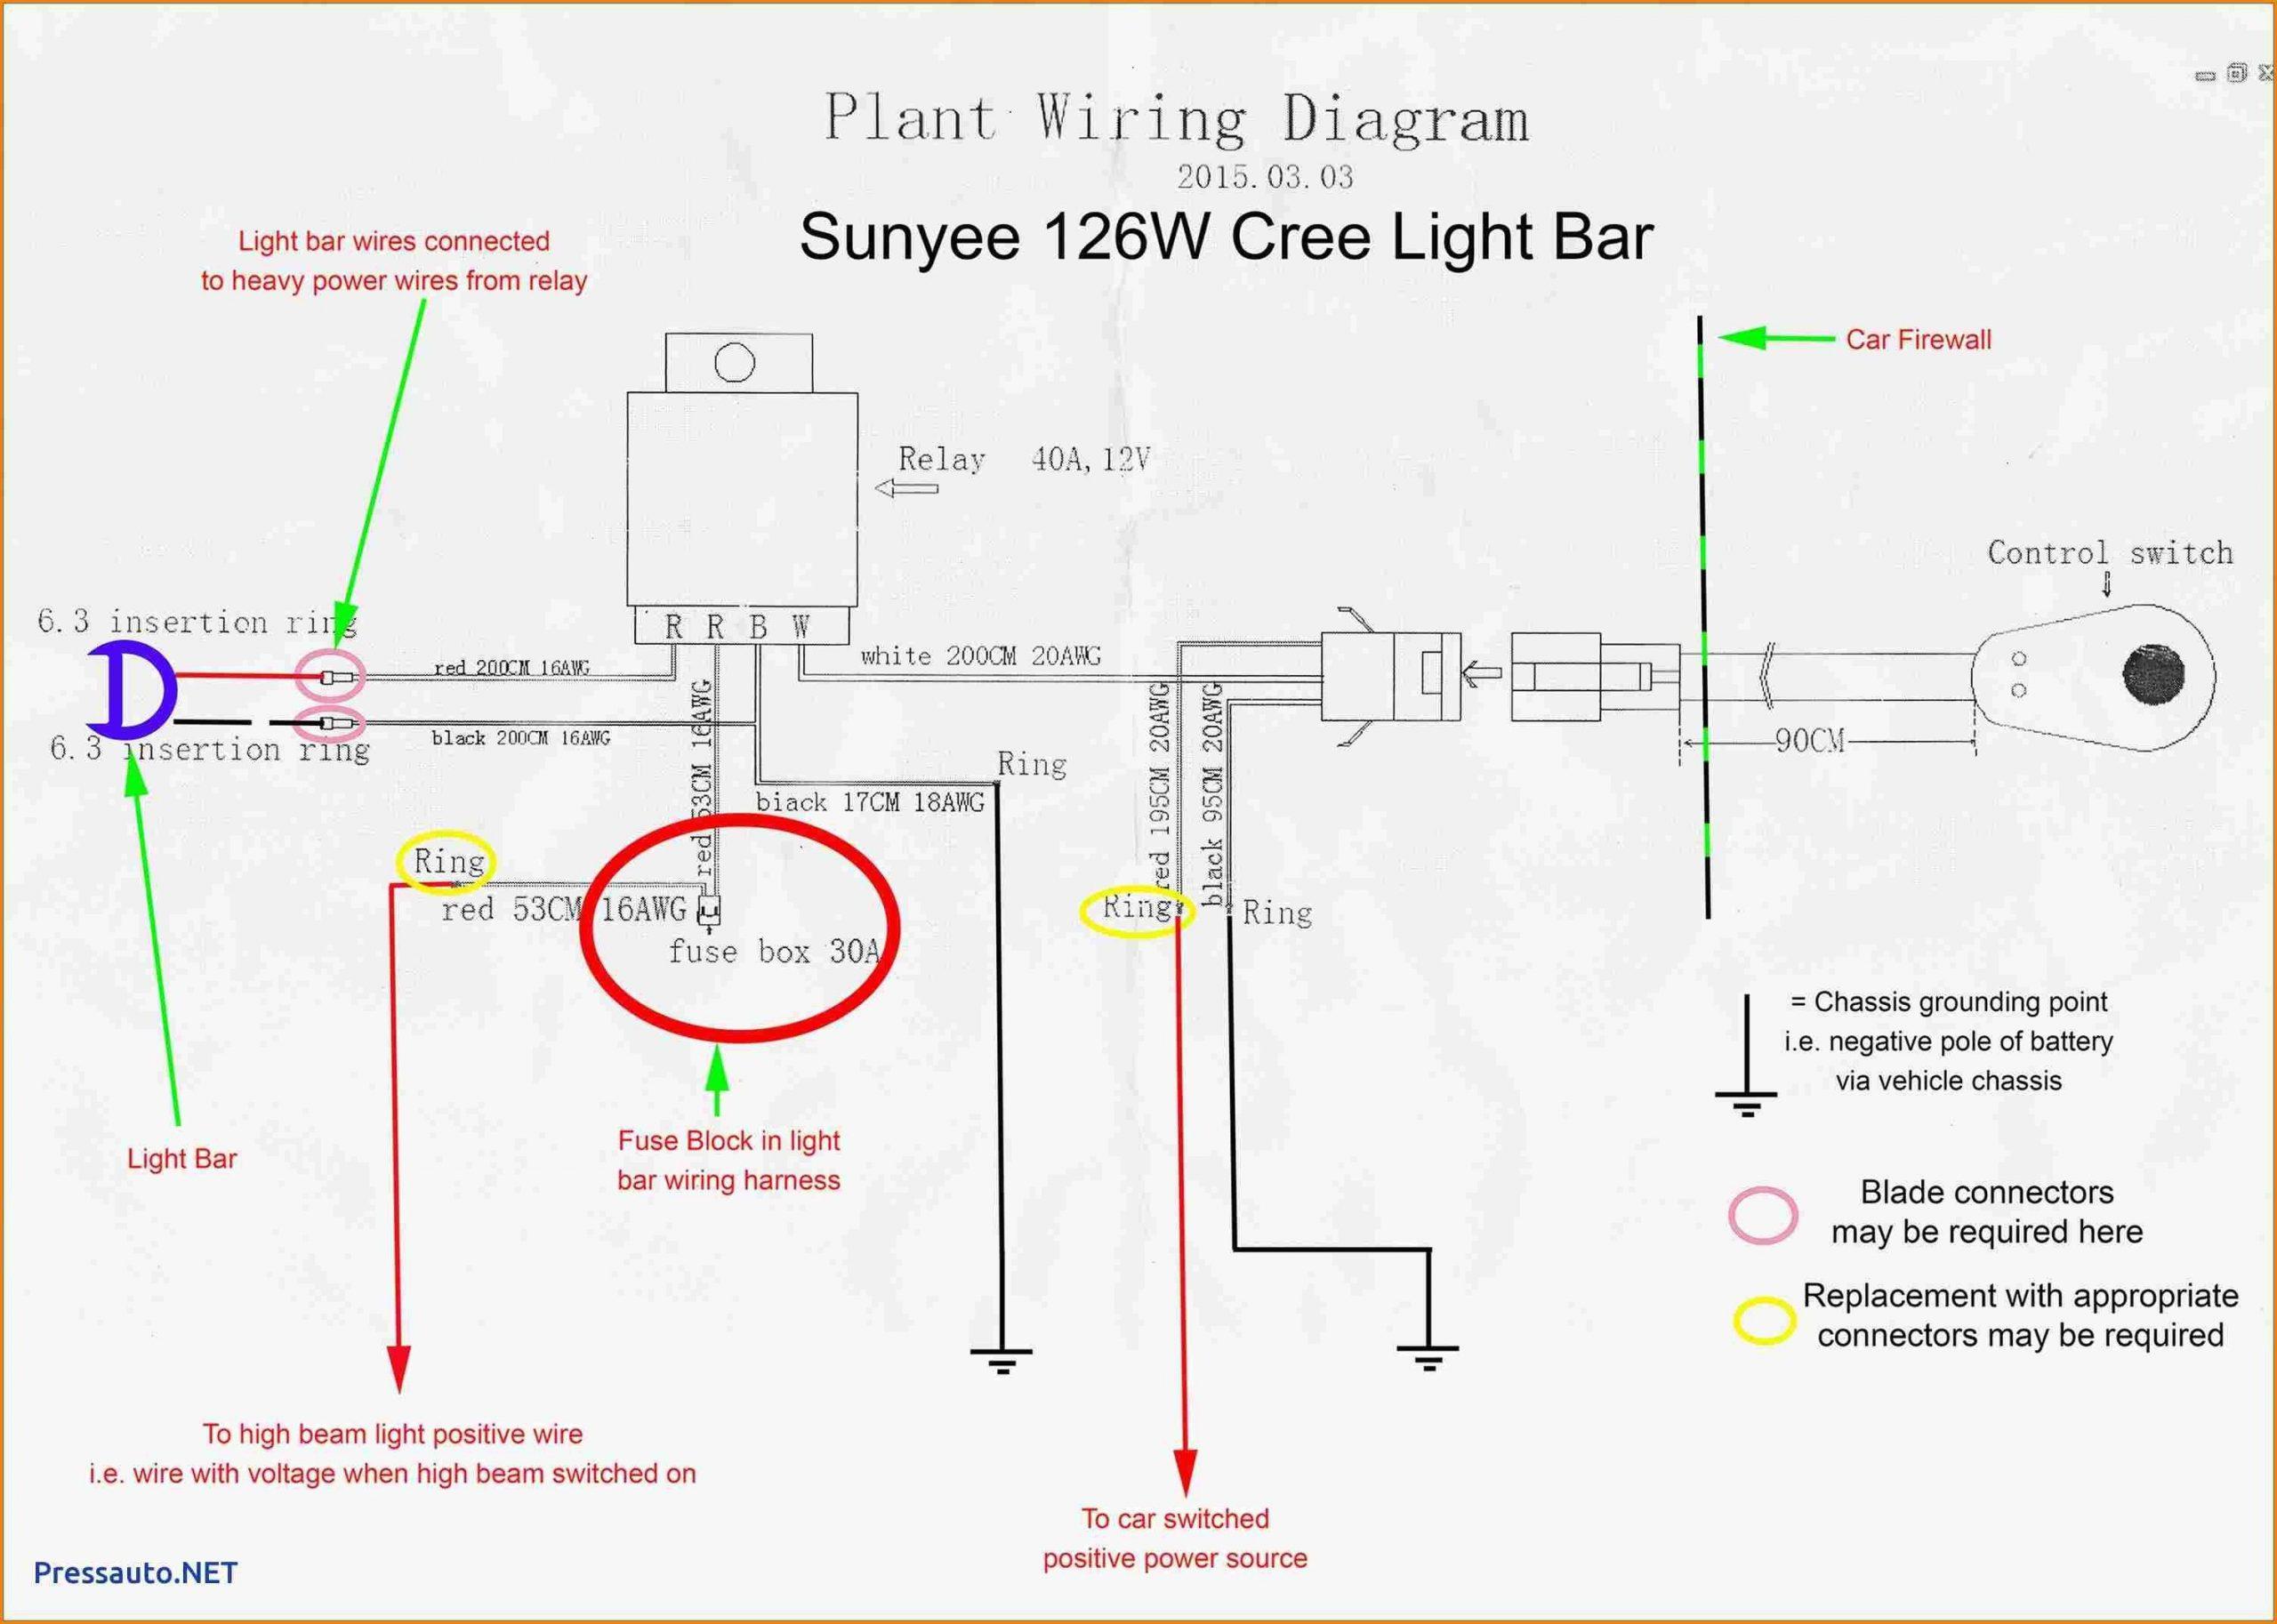 Truck Camper Wiring Diagram Diagram An_7316] Truck Camper Wiring Diagram Hd Quality Of Truck Camper Wiring Diagram